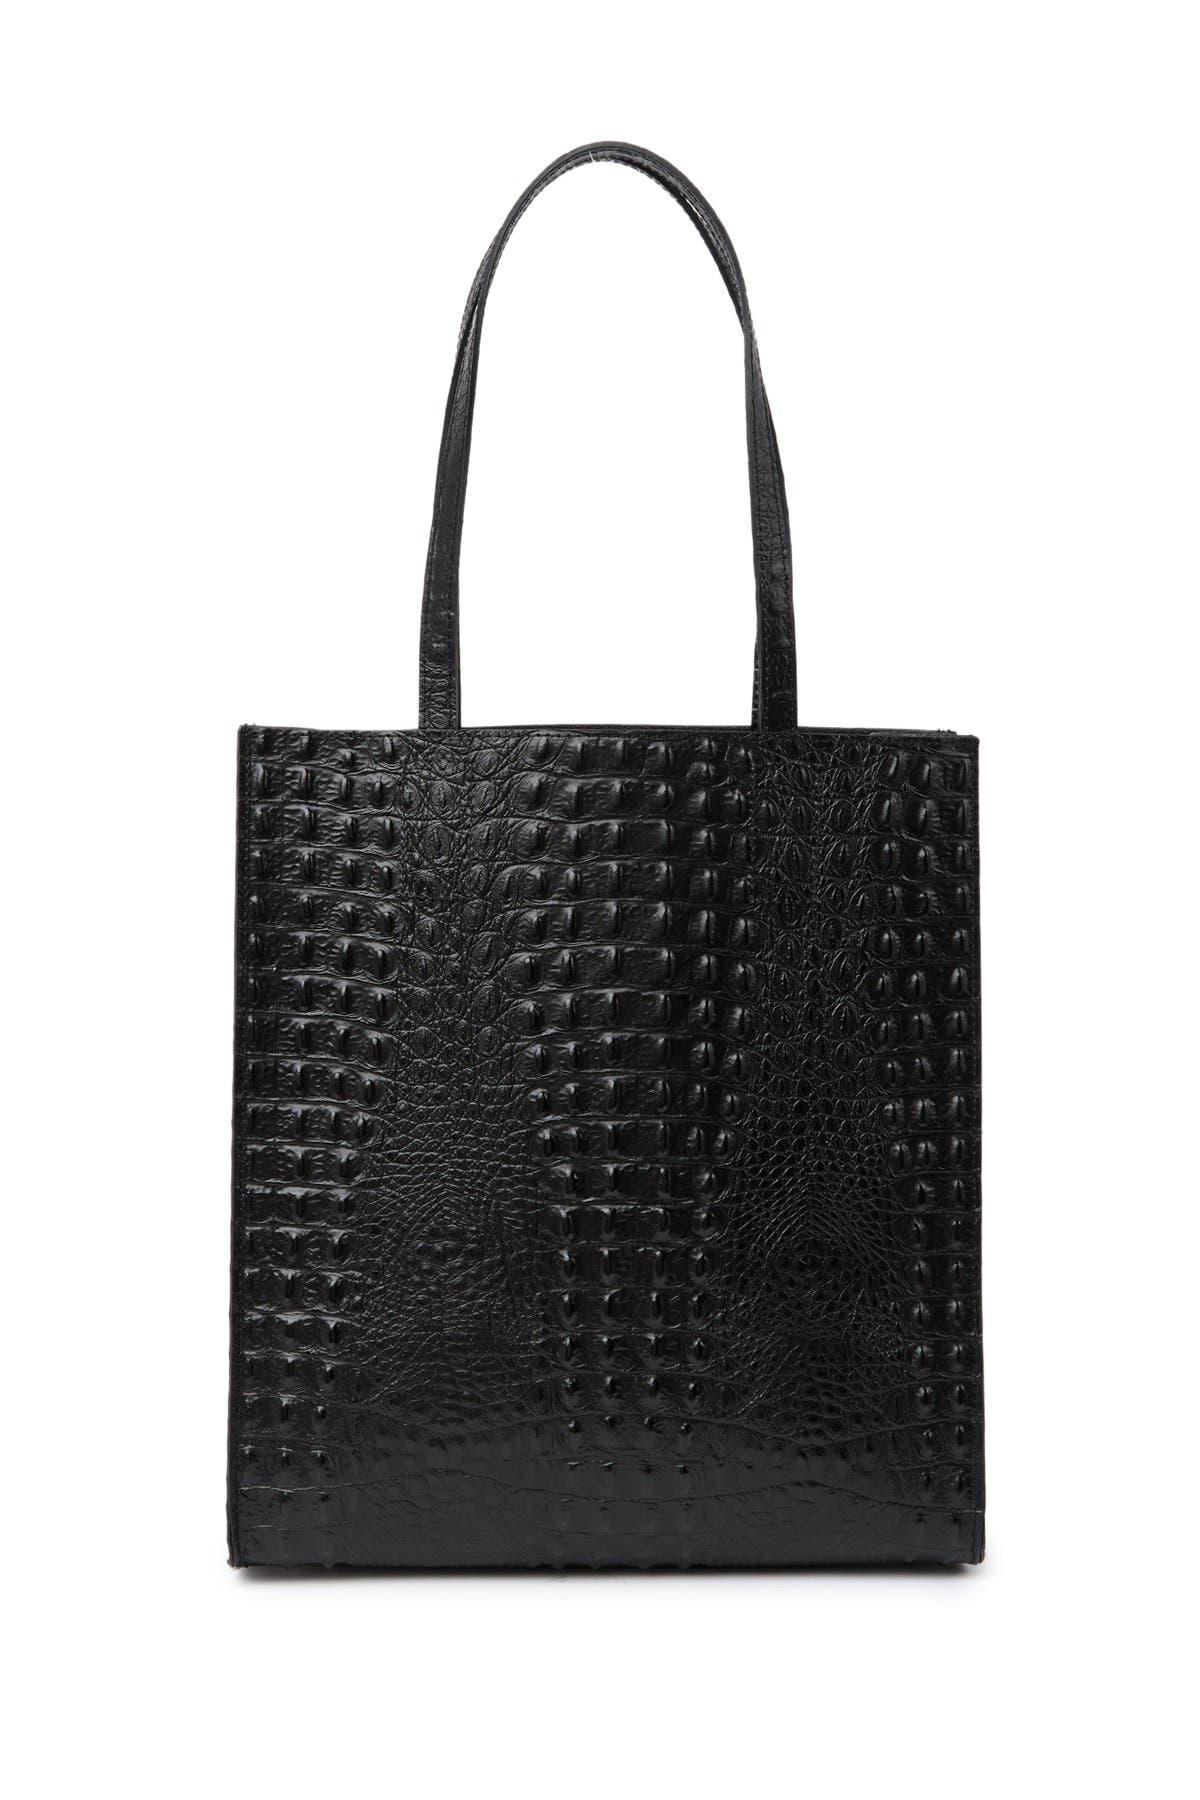 Image of Giulia Massari Embossed Leather Top Handle Tote